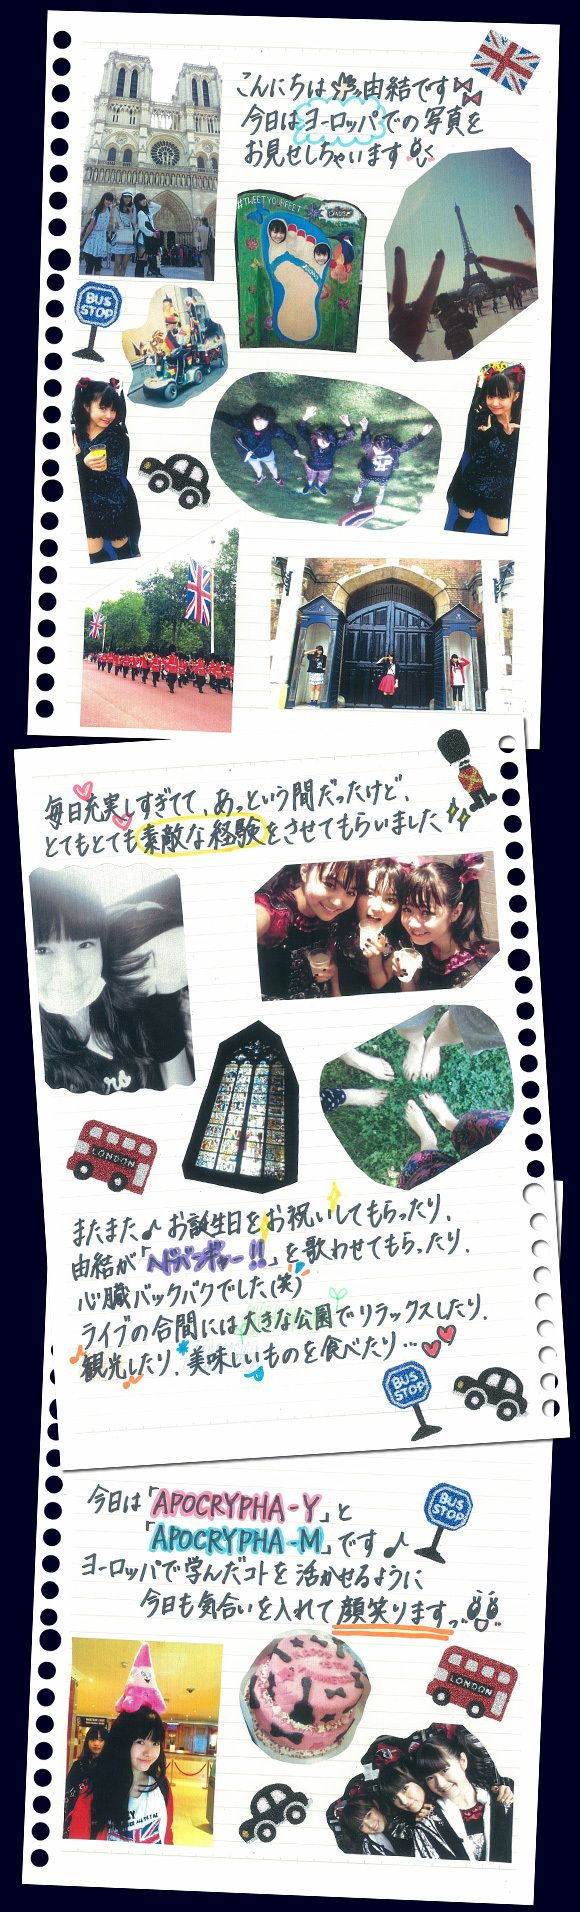 YUI-METAL❤|さくら学院オフィシャルブログ「学院日誌」Powered by Ameba